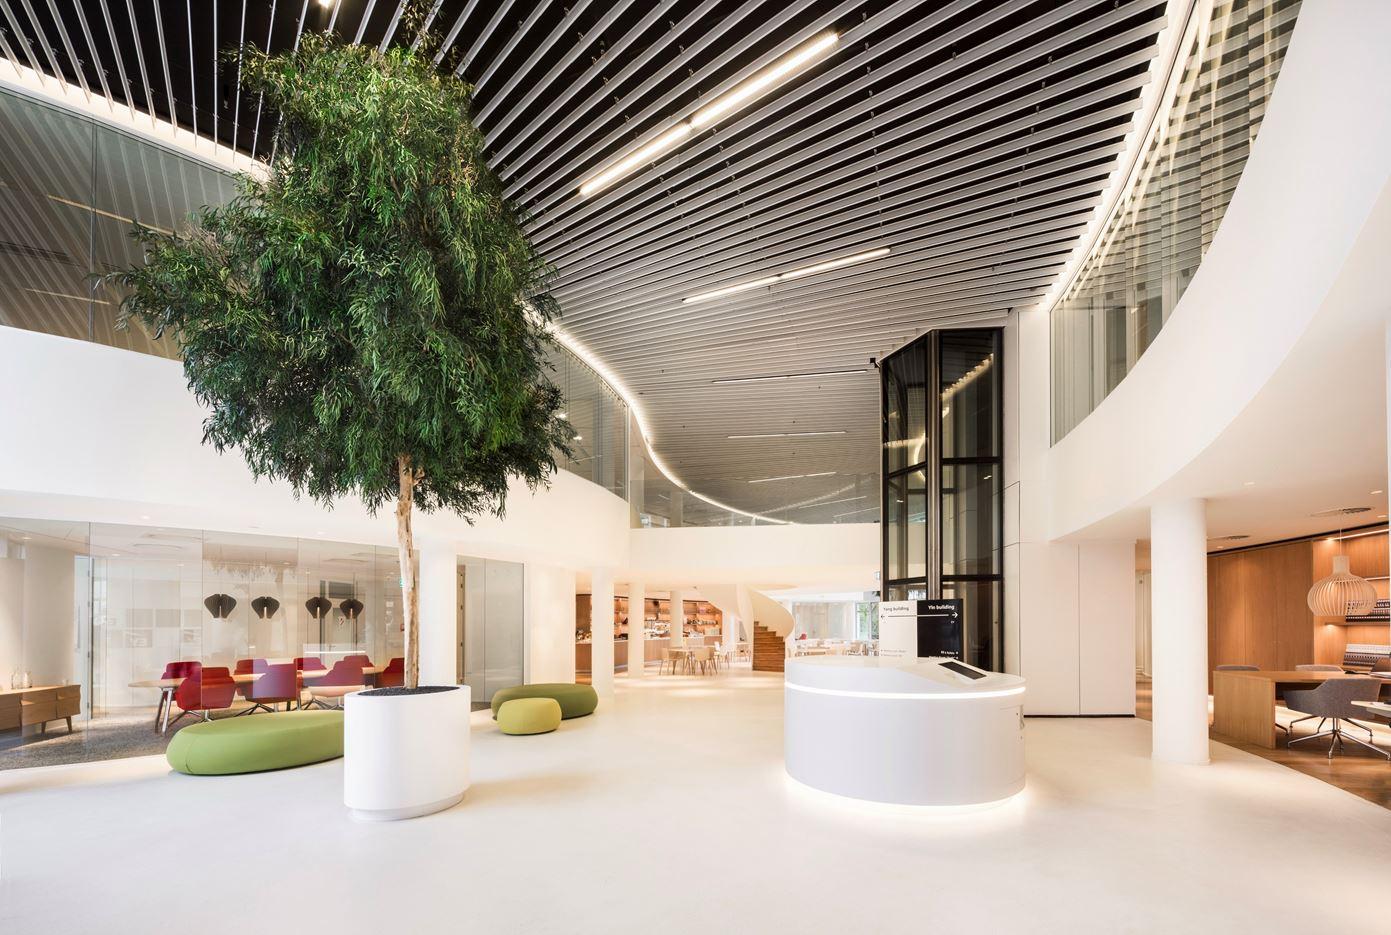 YinYang Office in Utrecht, Netherlands by Hofman Dujardin Architects